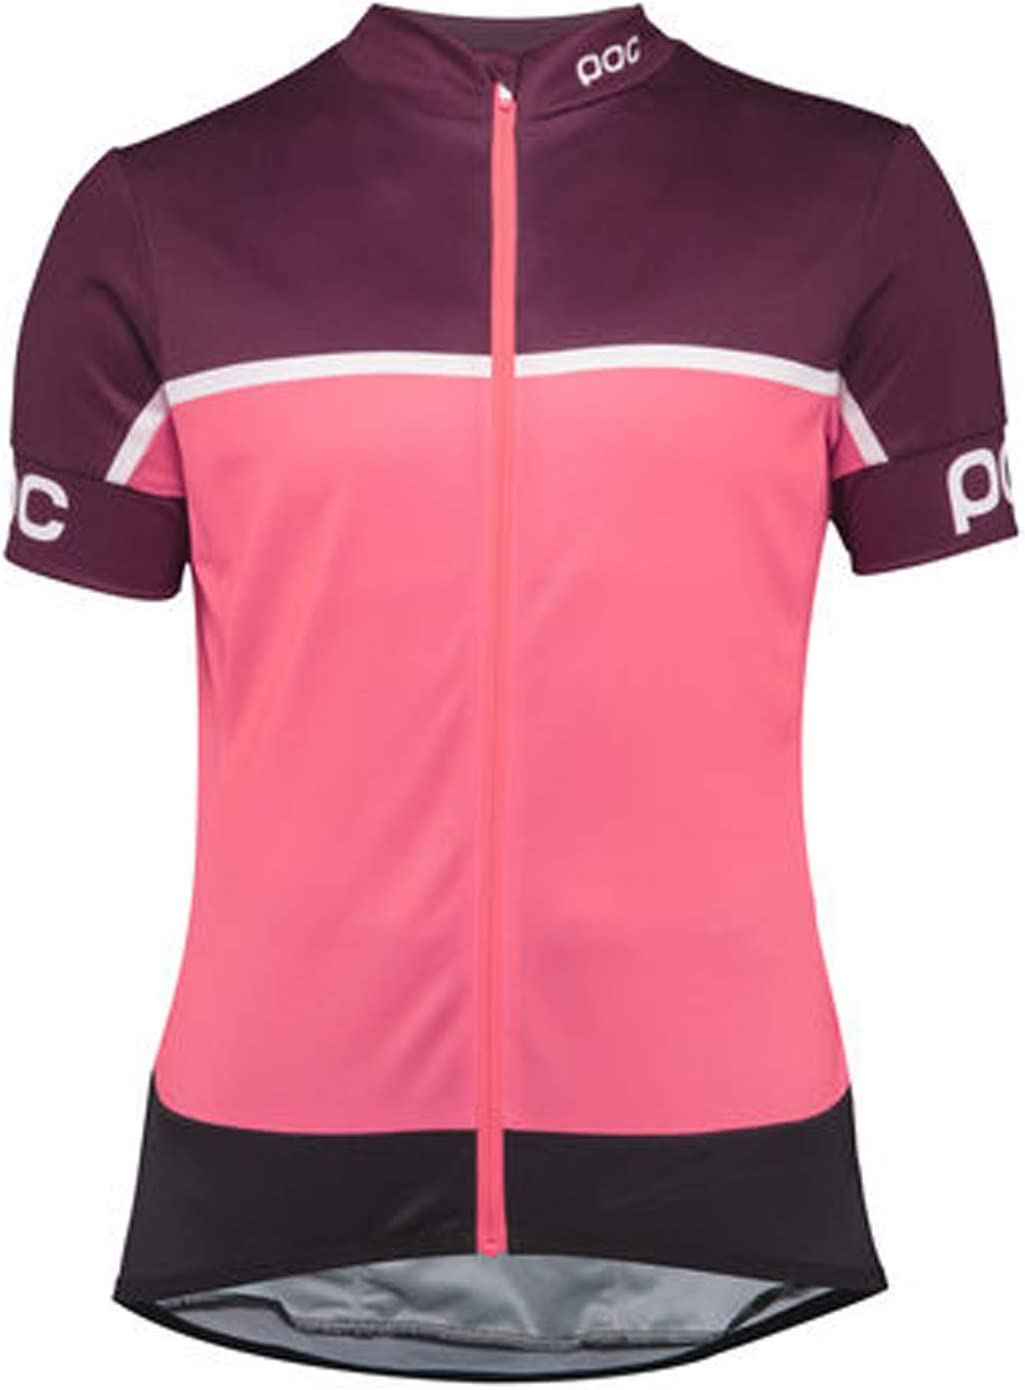 Essential Road Women Block Jersey Short Sleeve Cycling Jersey POC